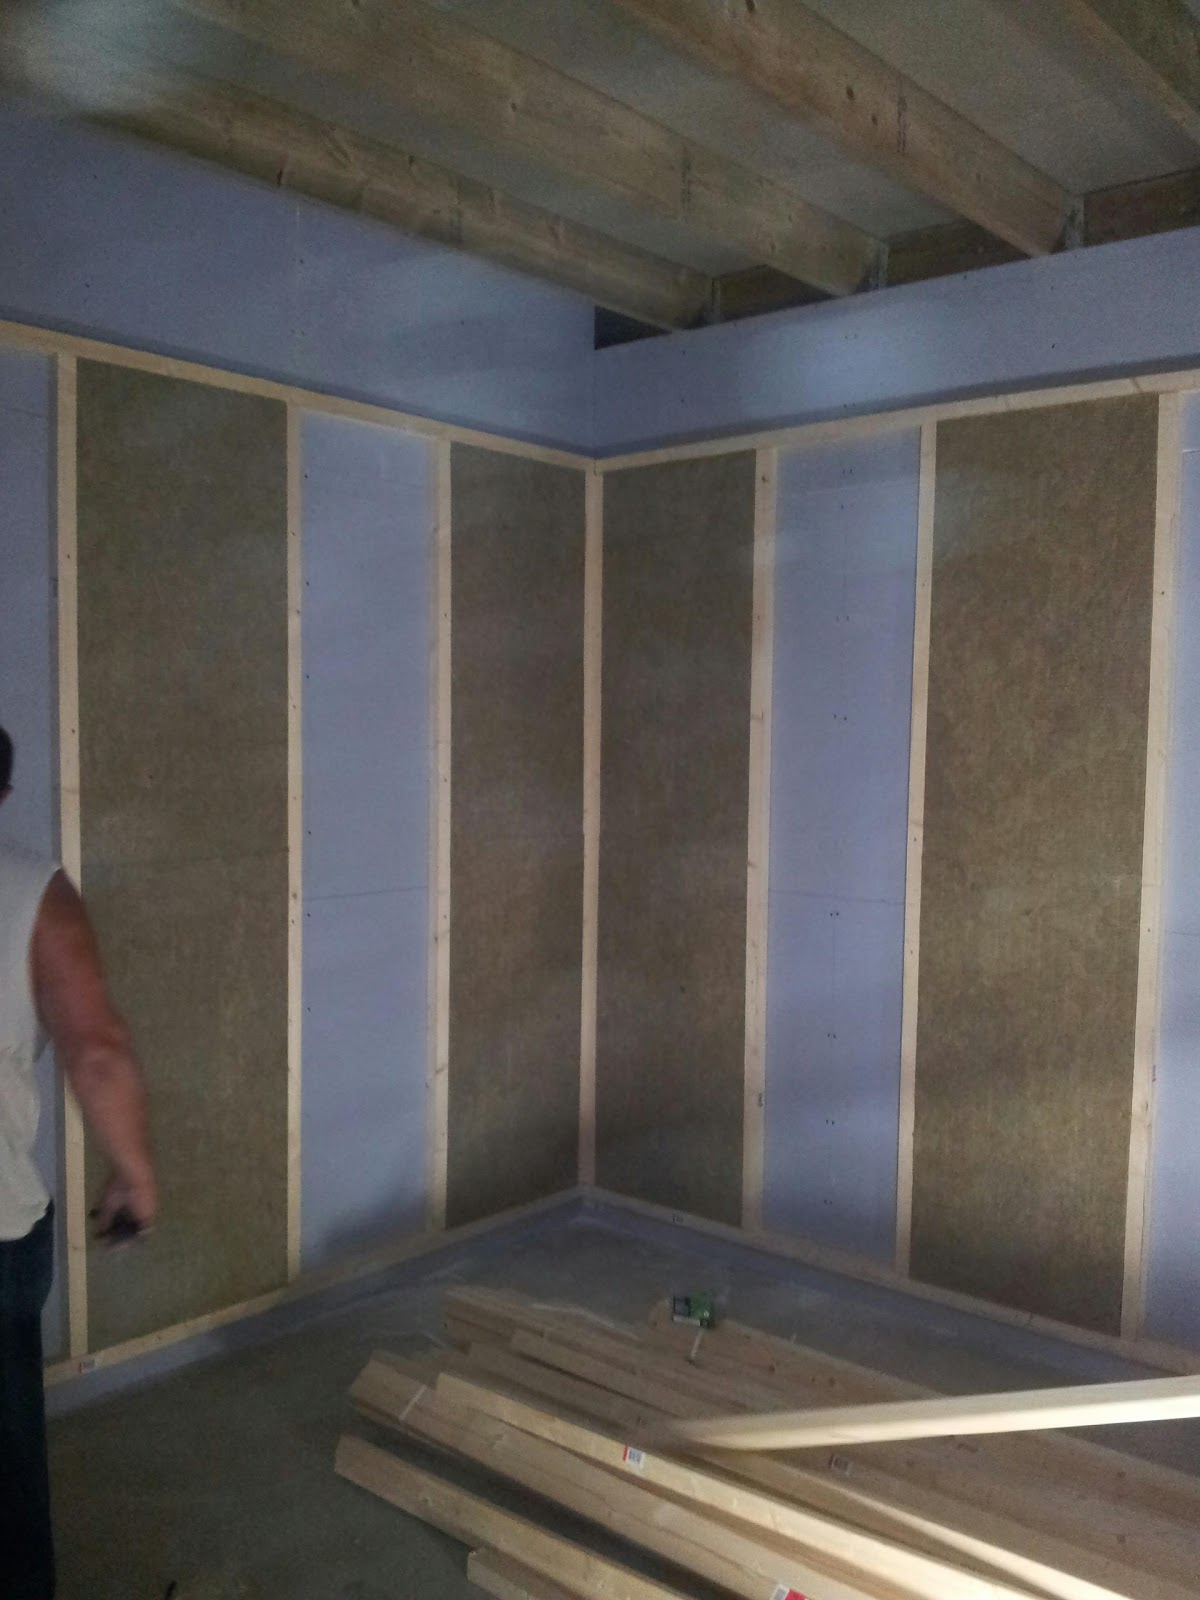 wcsc recording studio and radio build soundproof walls